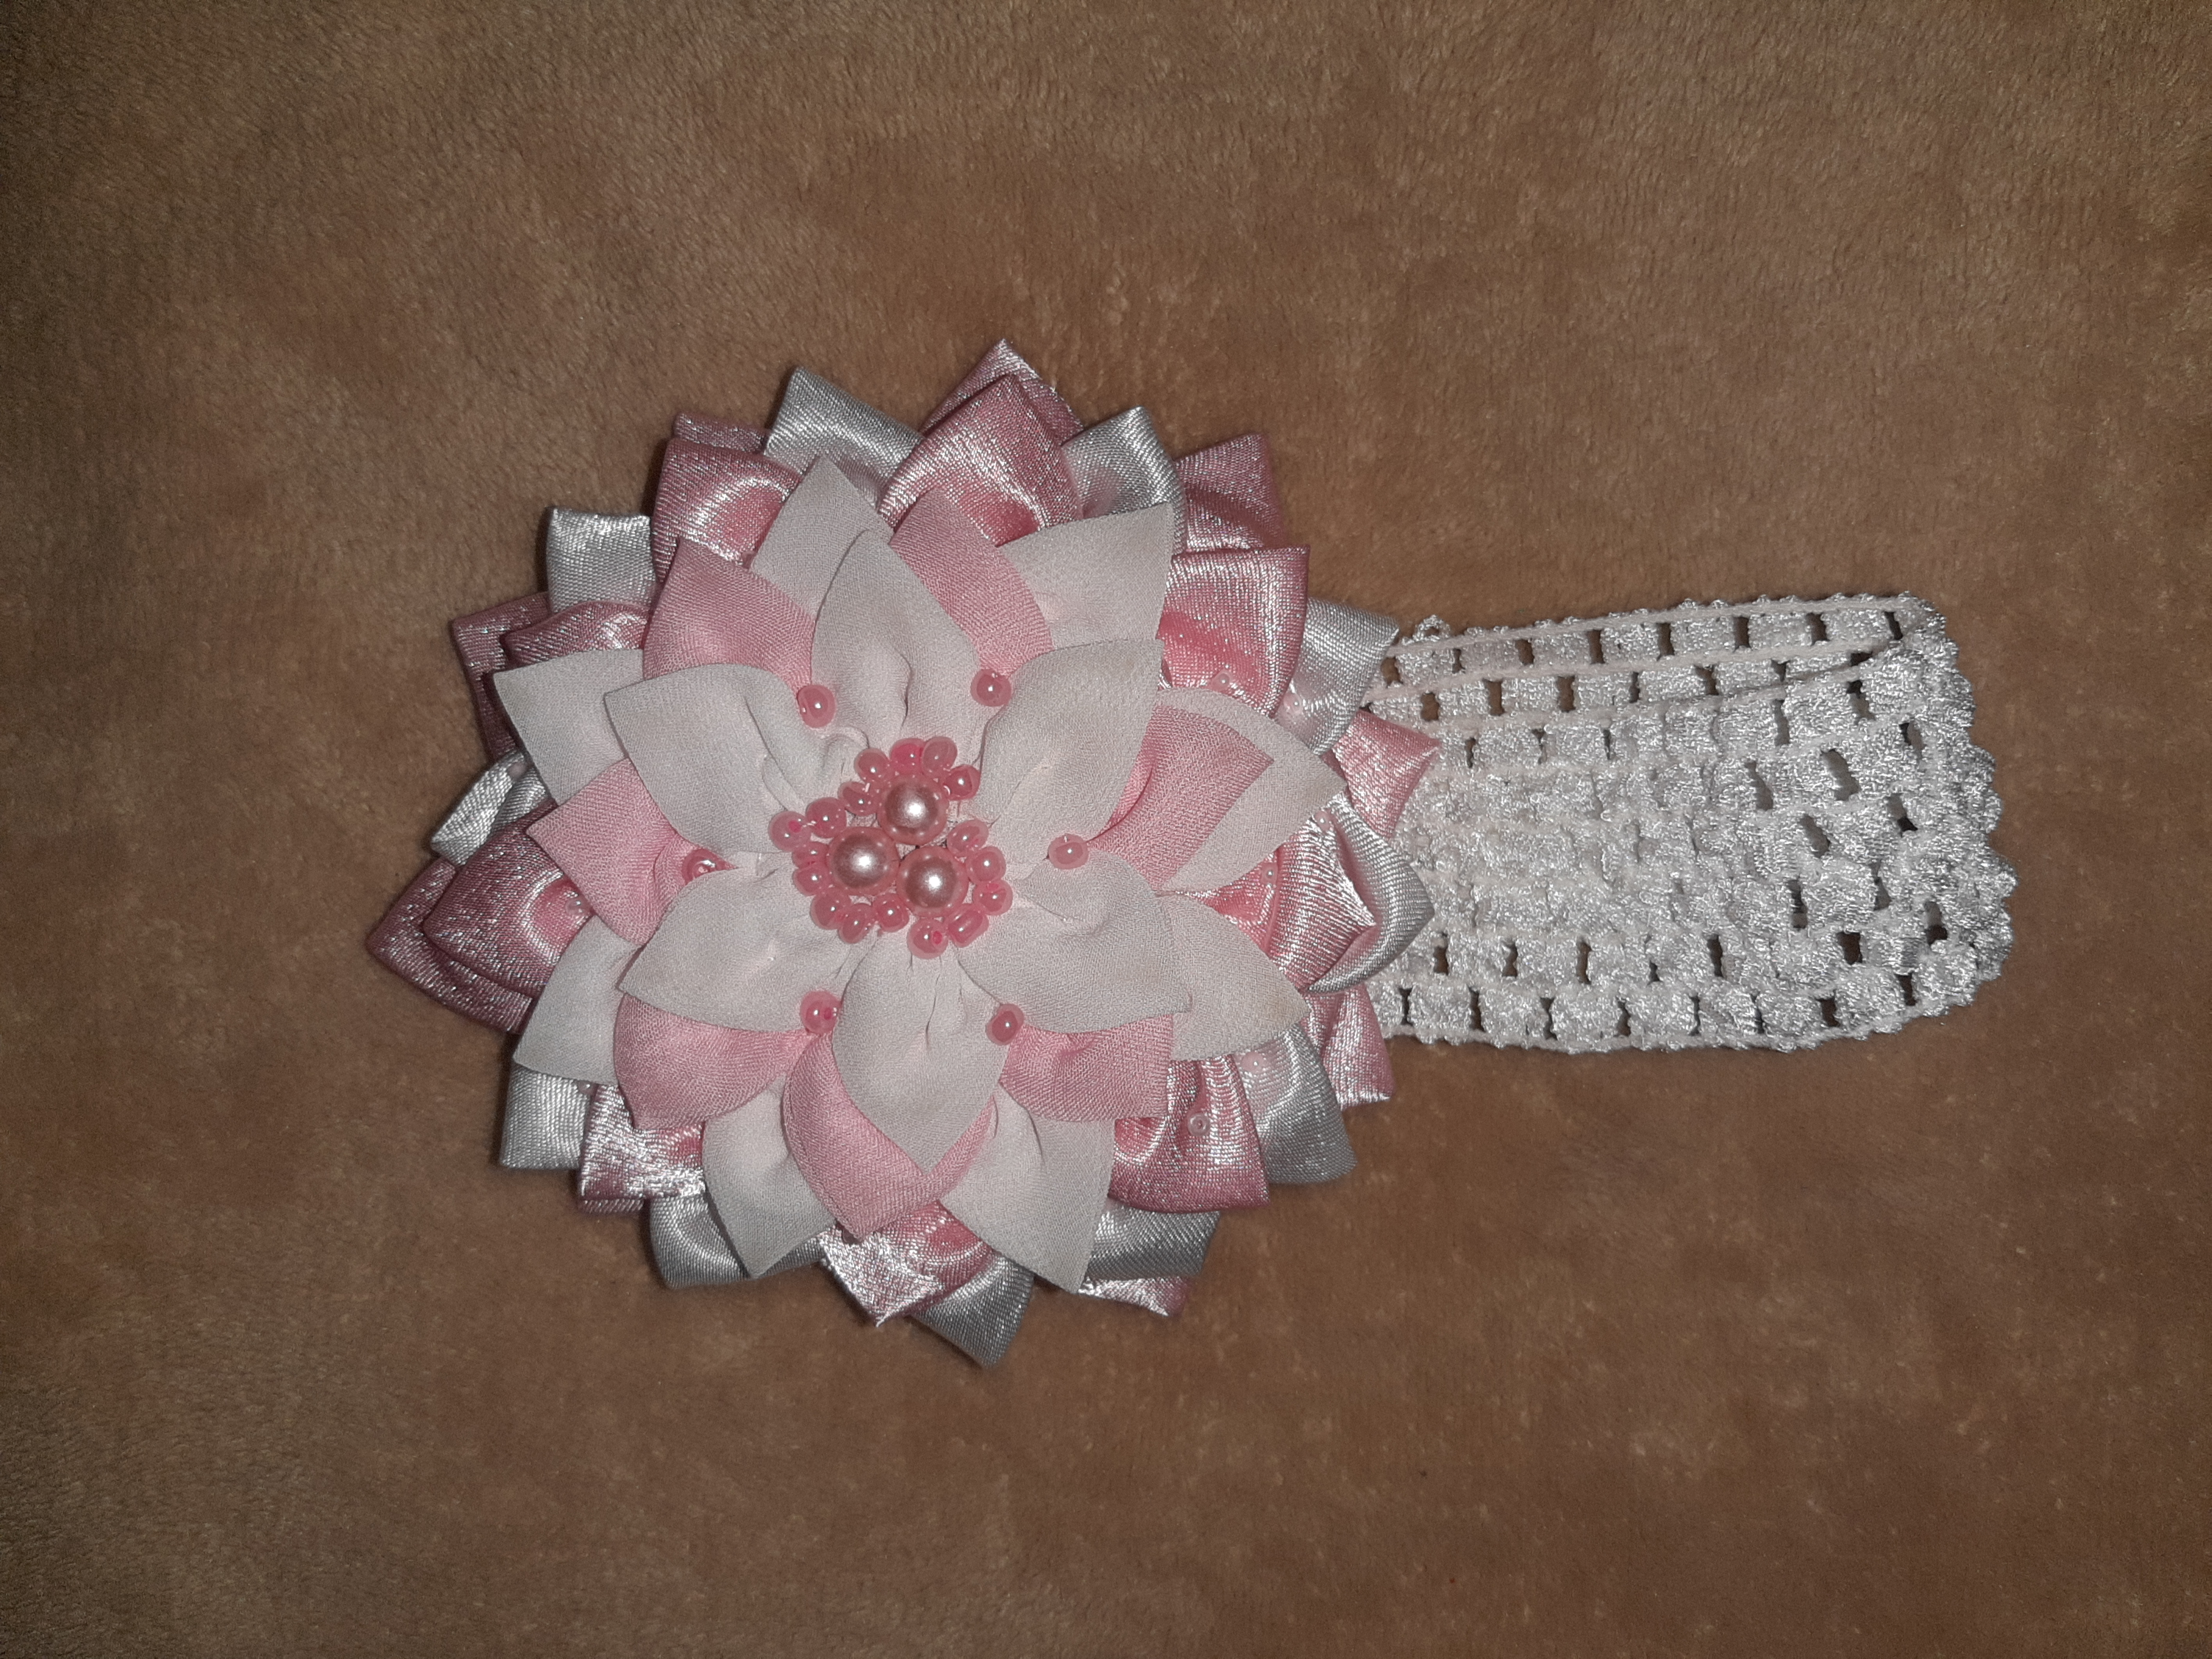 Шикарная повязка на вашу принцессу!